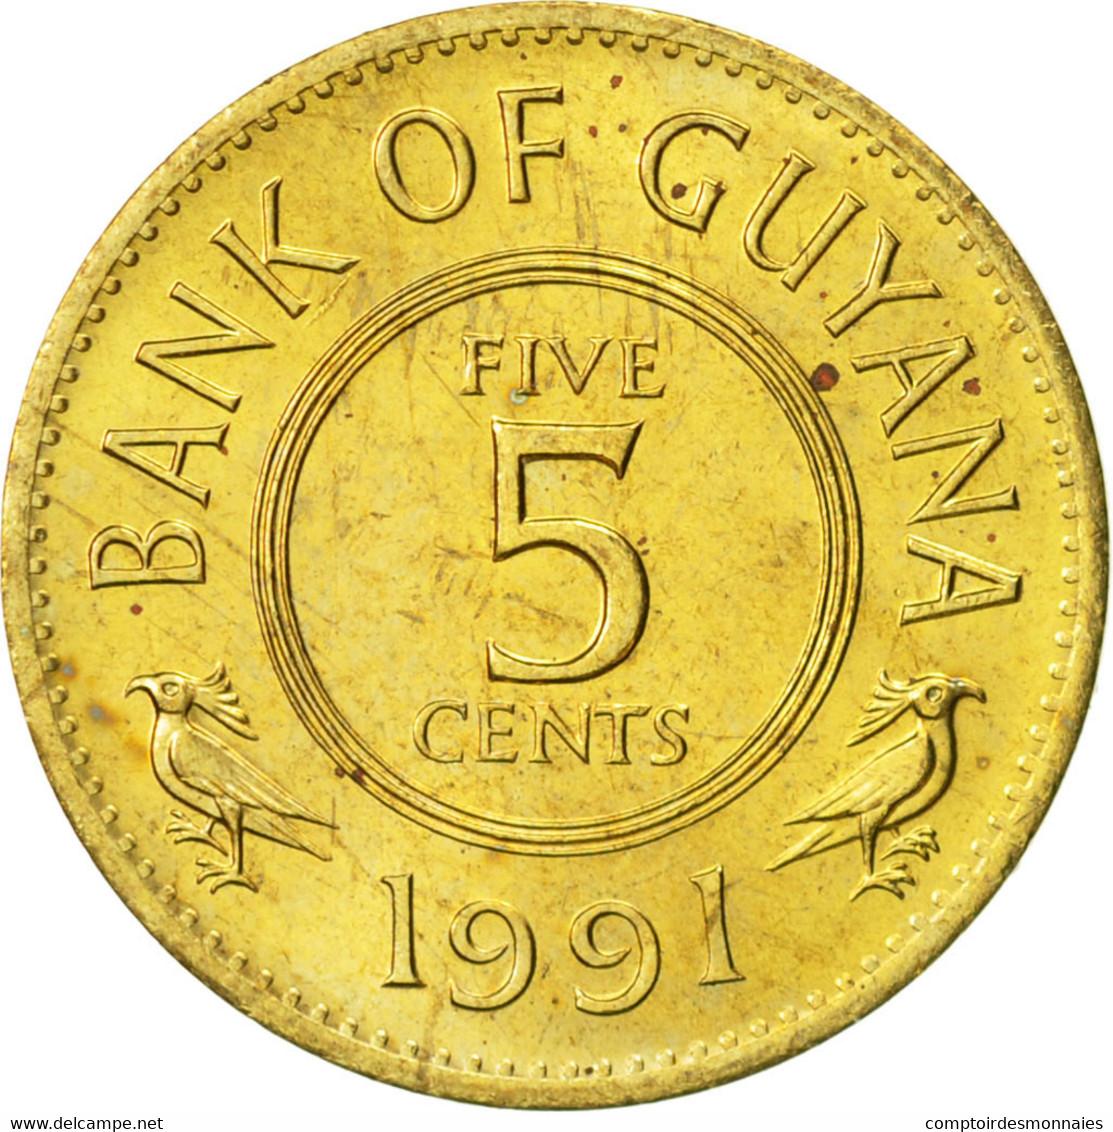 Guyana, 5 Cents, 1991, SUP, Nickel-brass, KM:32 - Guyana